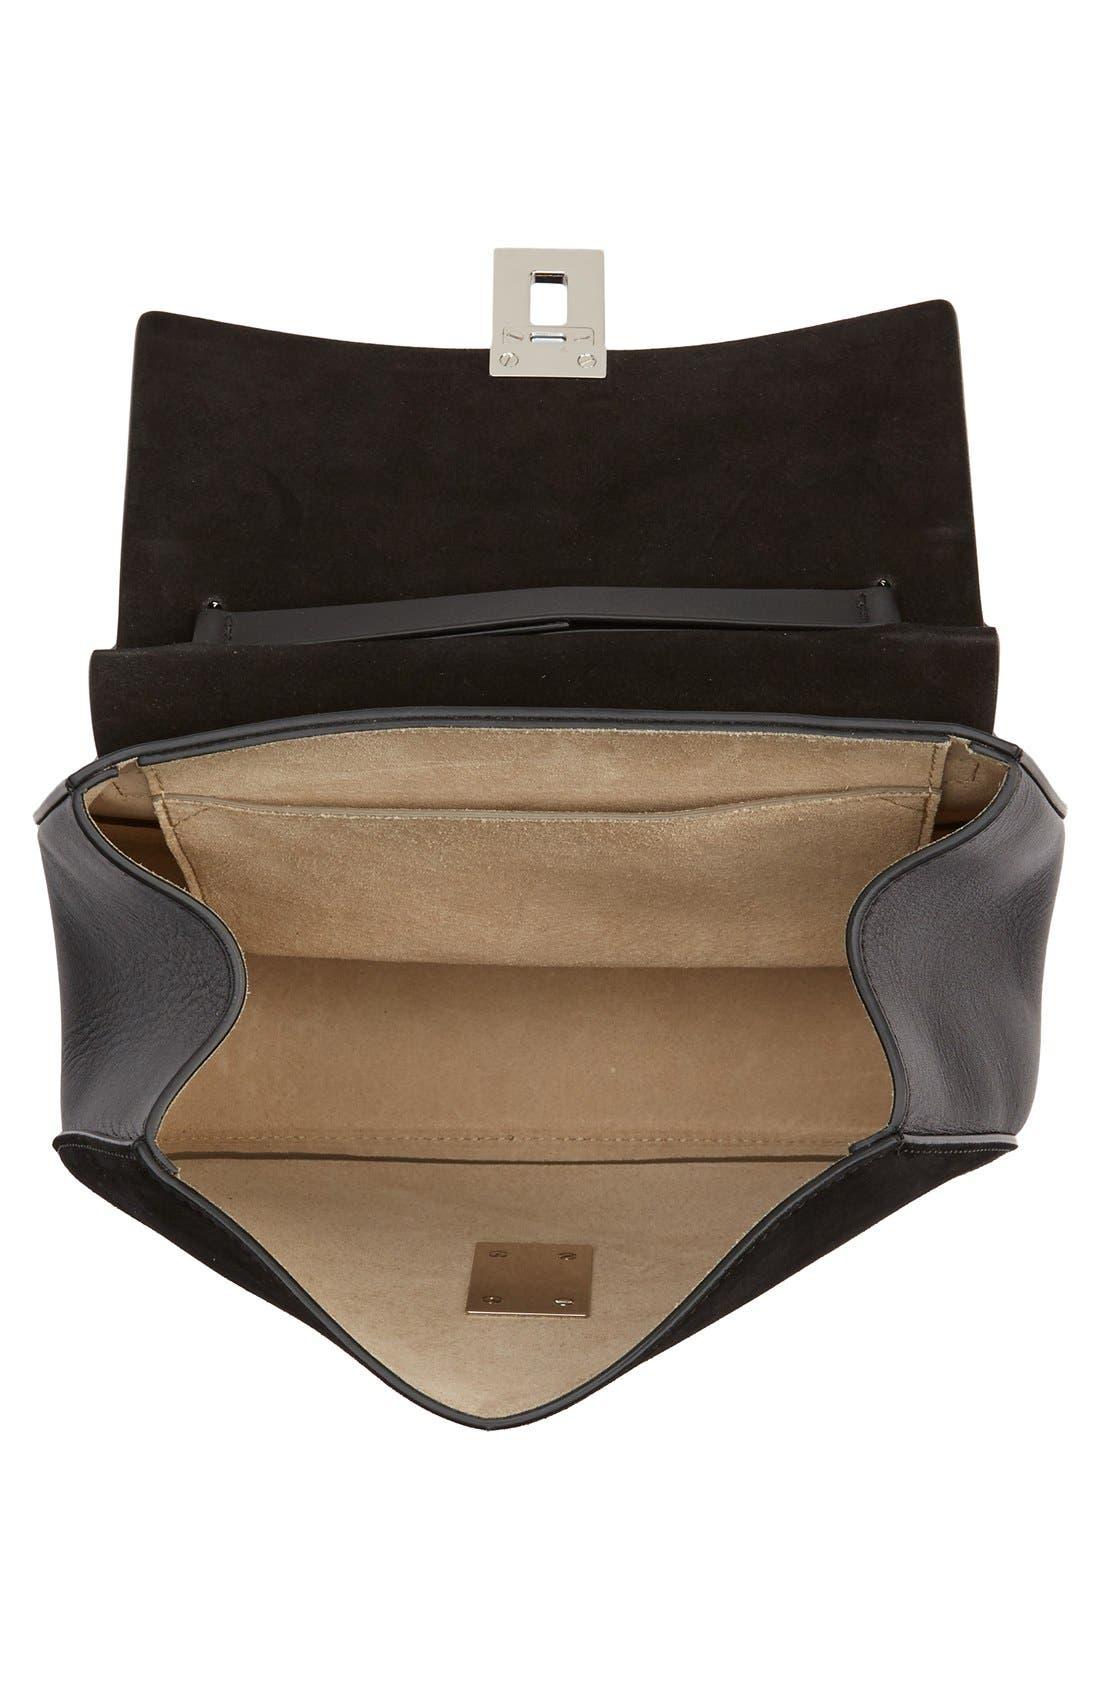 CHLOÉ, Small Drew Leather & Suede Shoulder Bag, Alternate thumbnail 4, color, 001